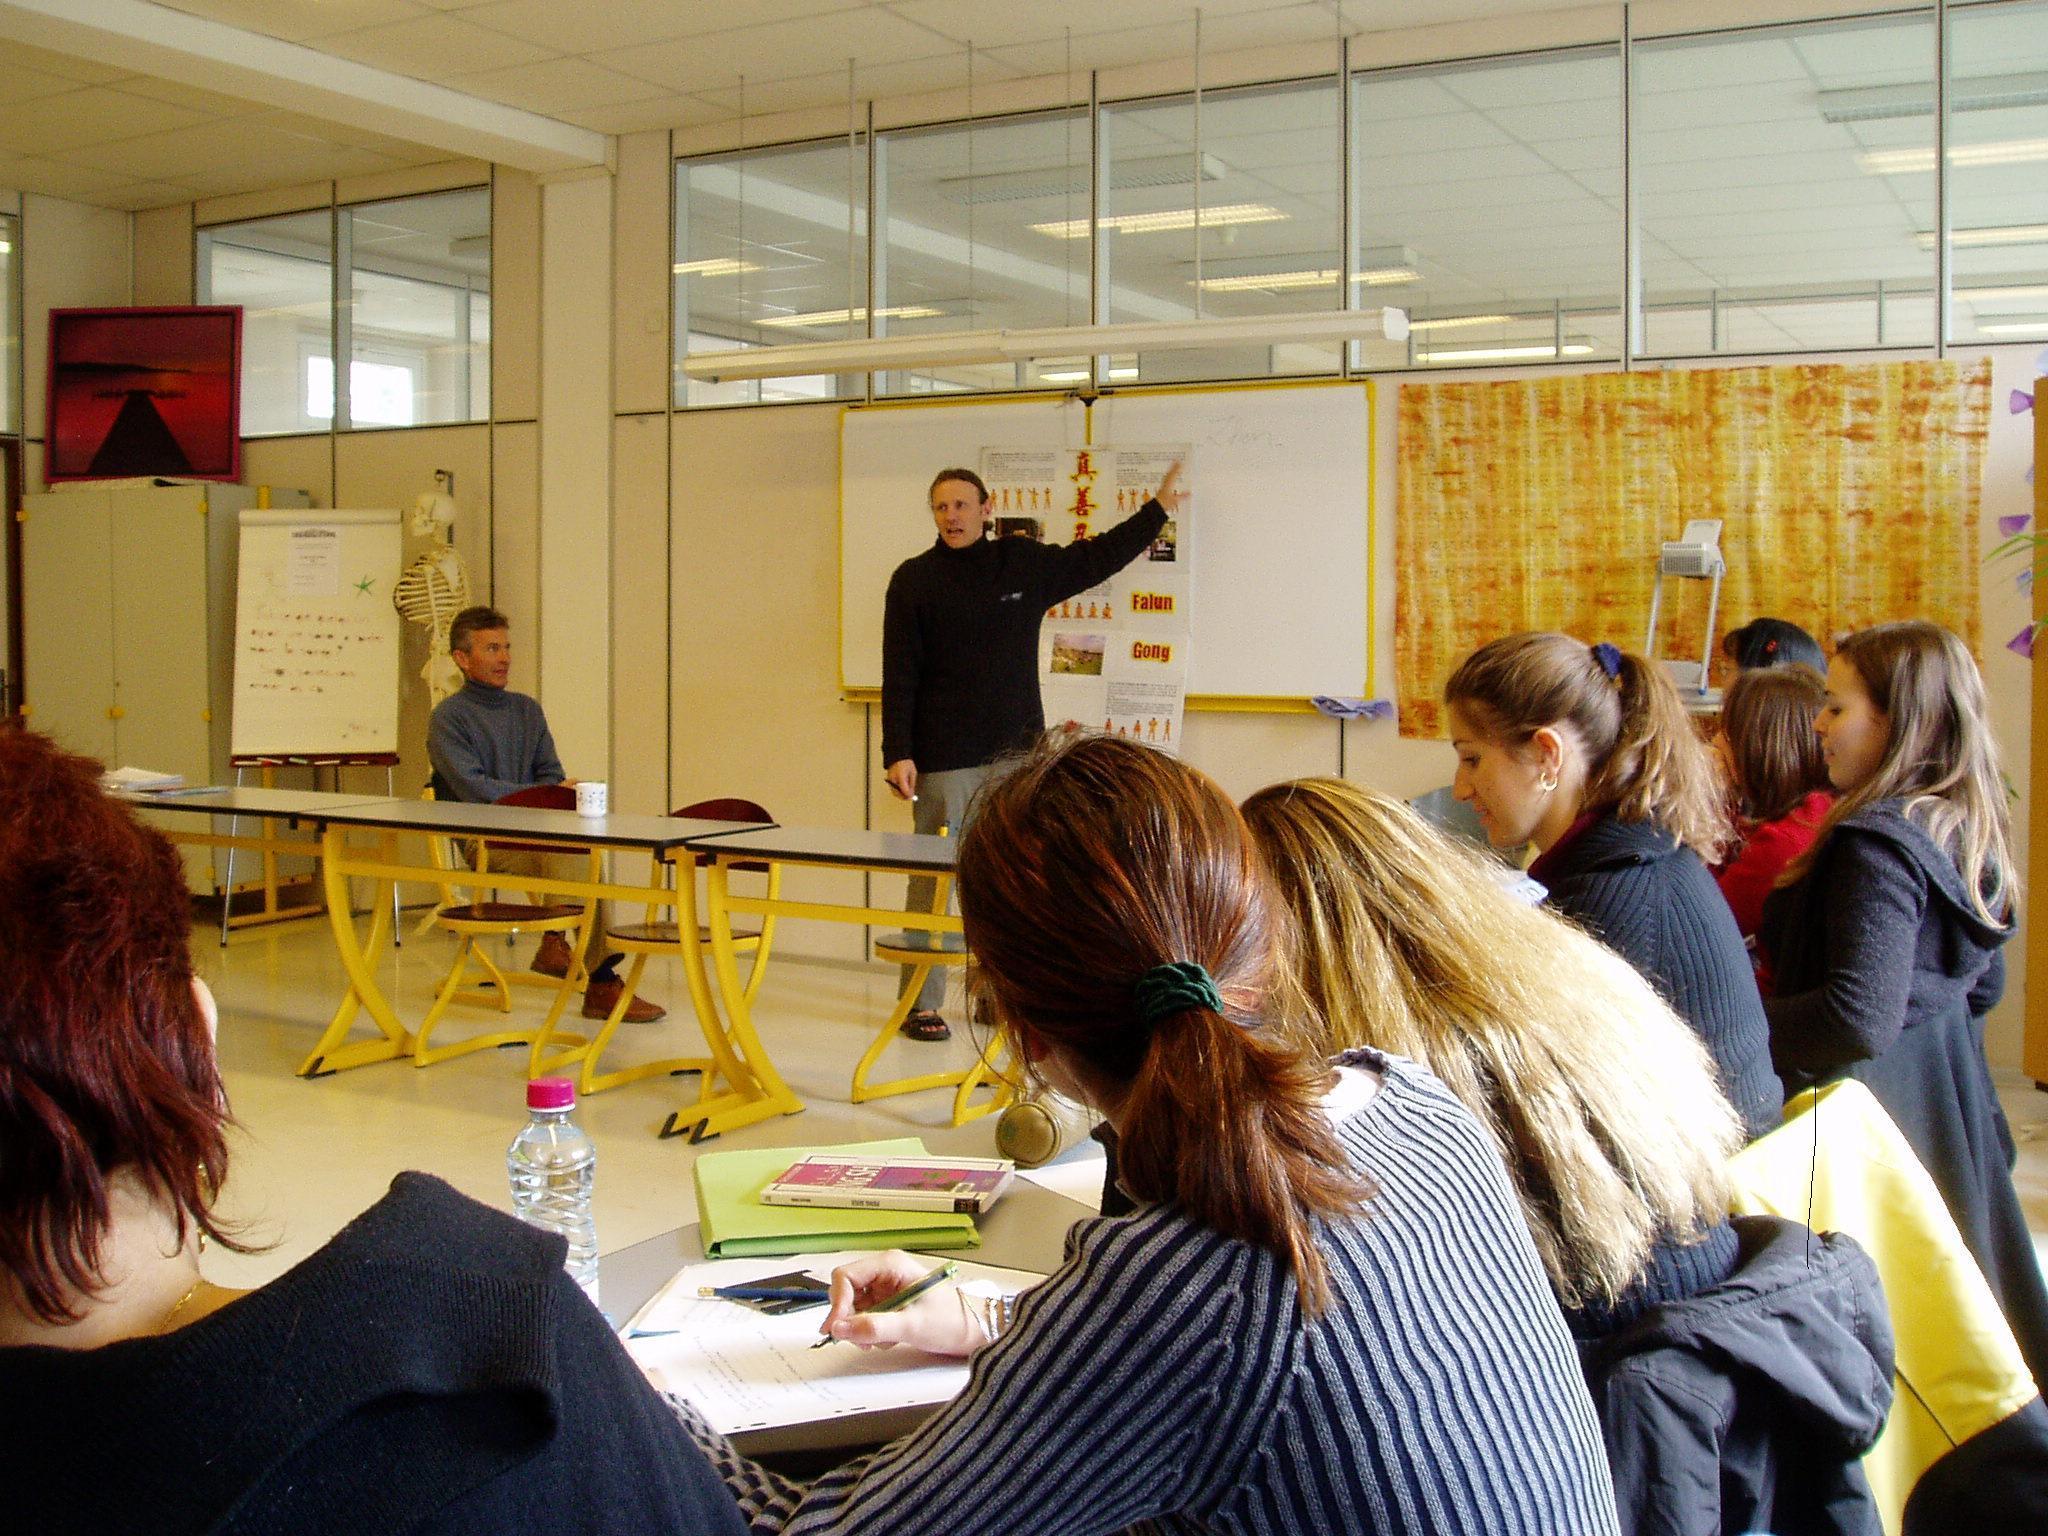 France Nursing School In Southern France Invites